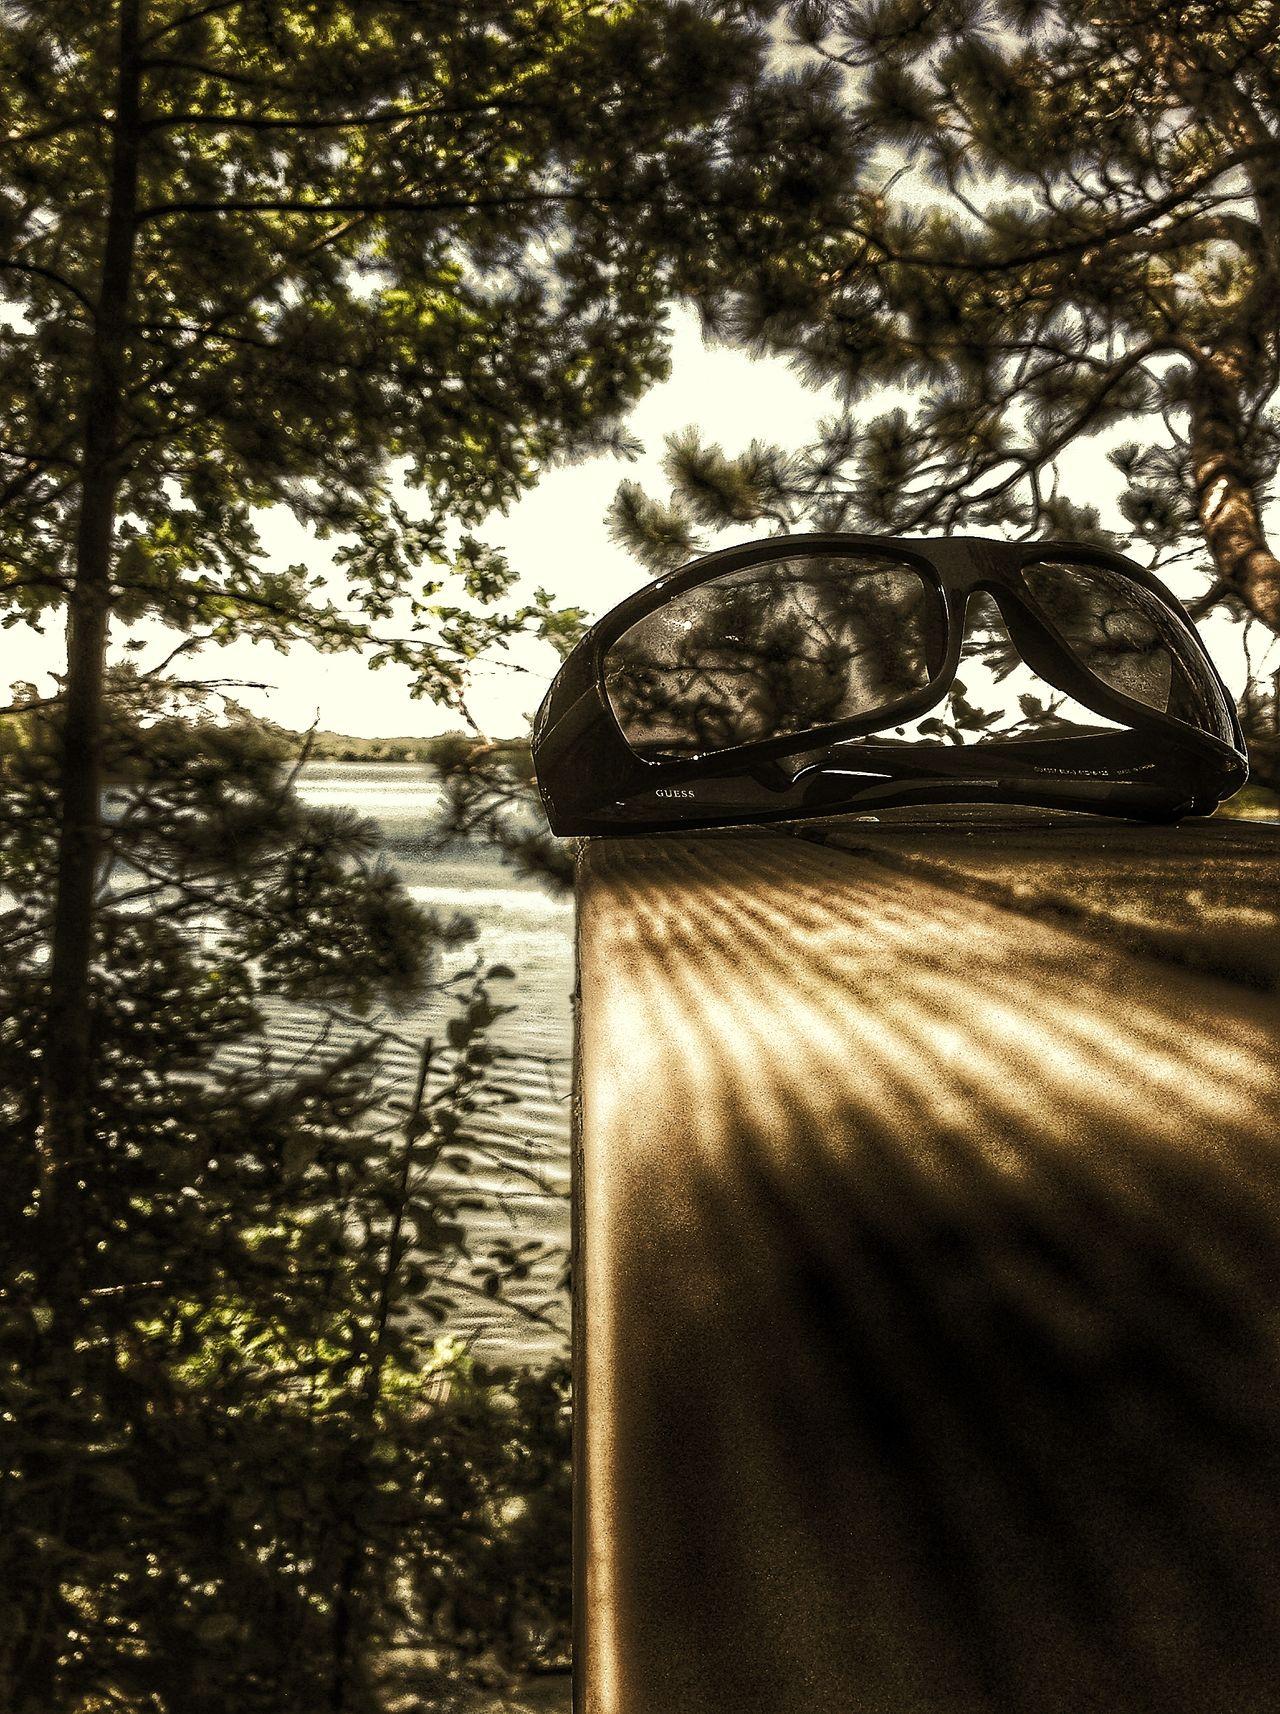 Shades Sunglasses Bemidji Whiskey Sour Minnesota Lake View